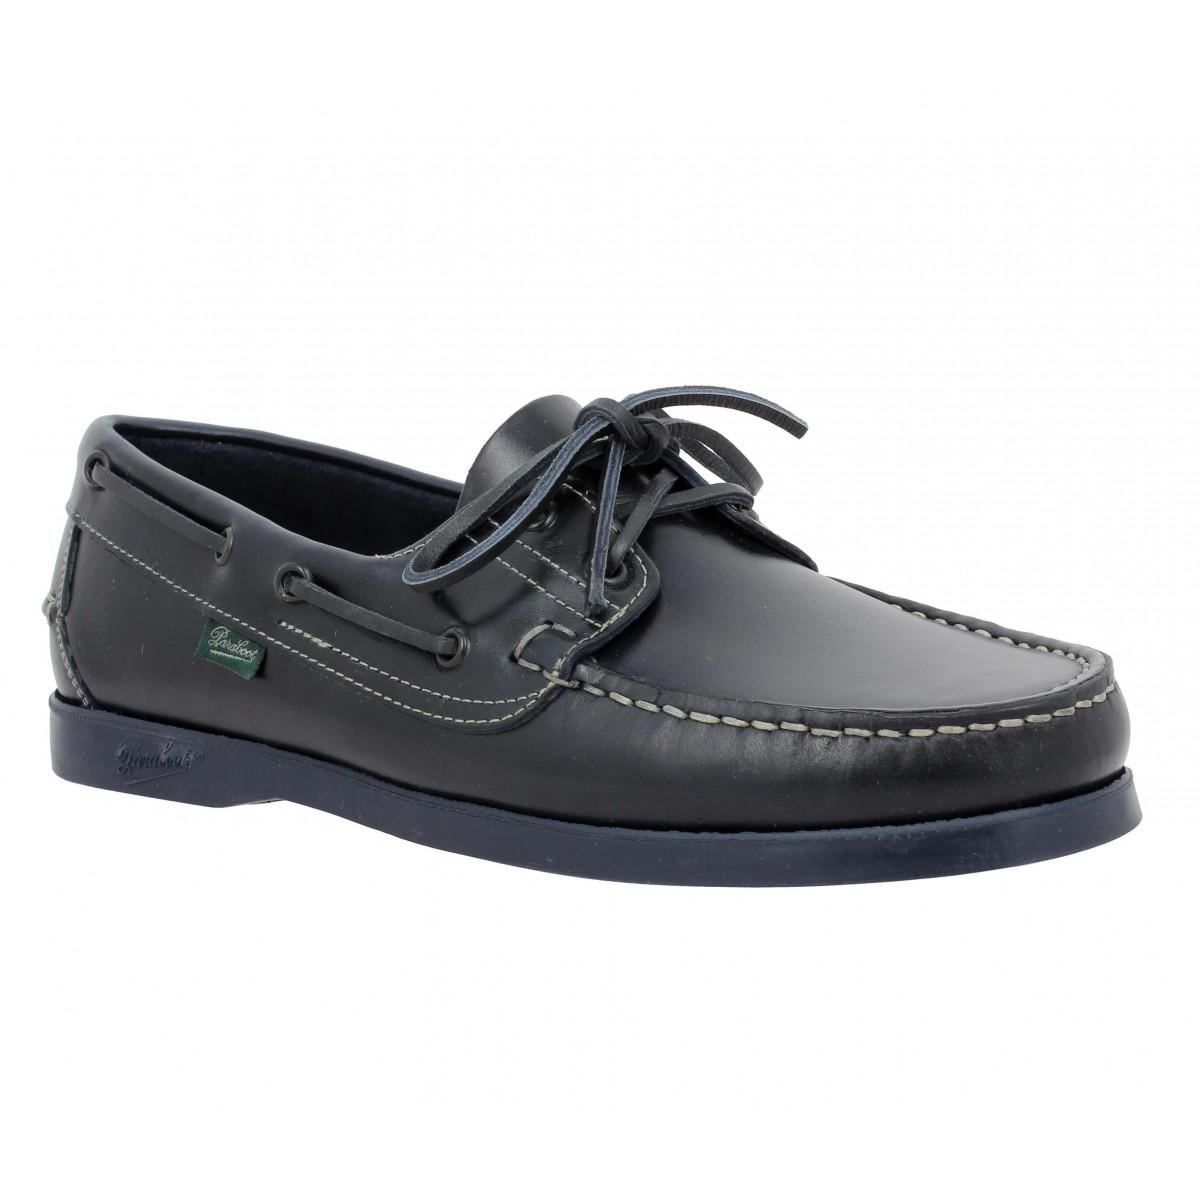 Chaussures bateaux PARABOOT Barth cuir Homme Marine